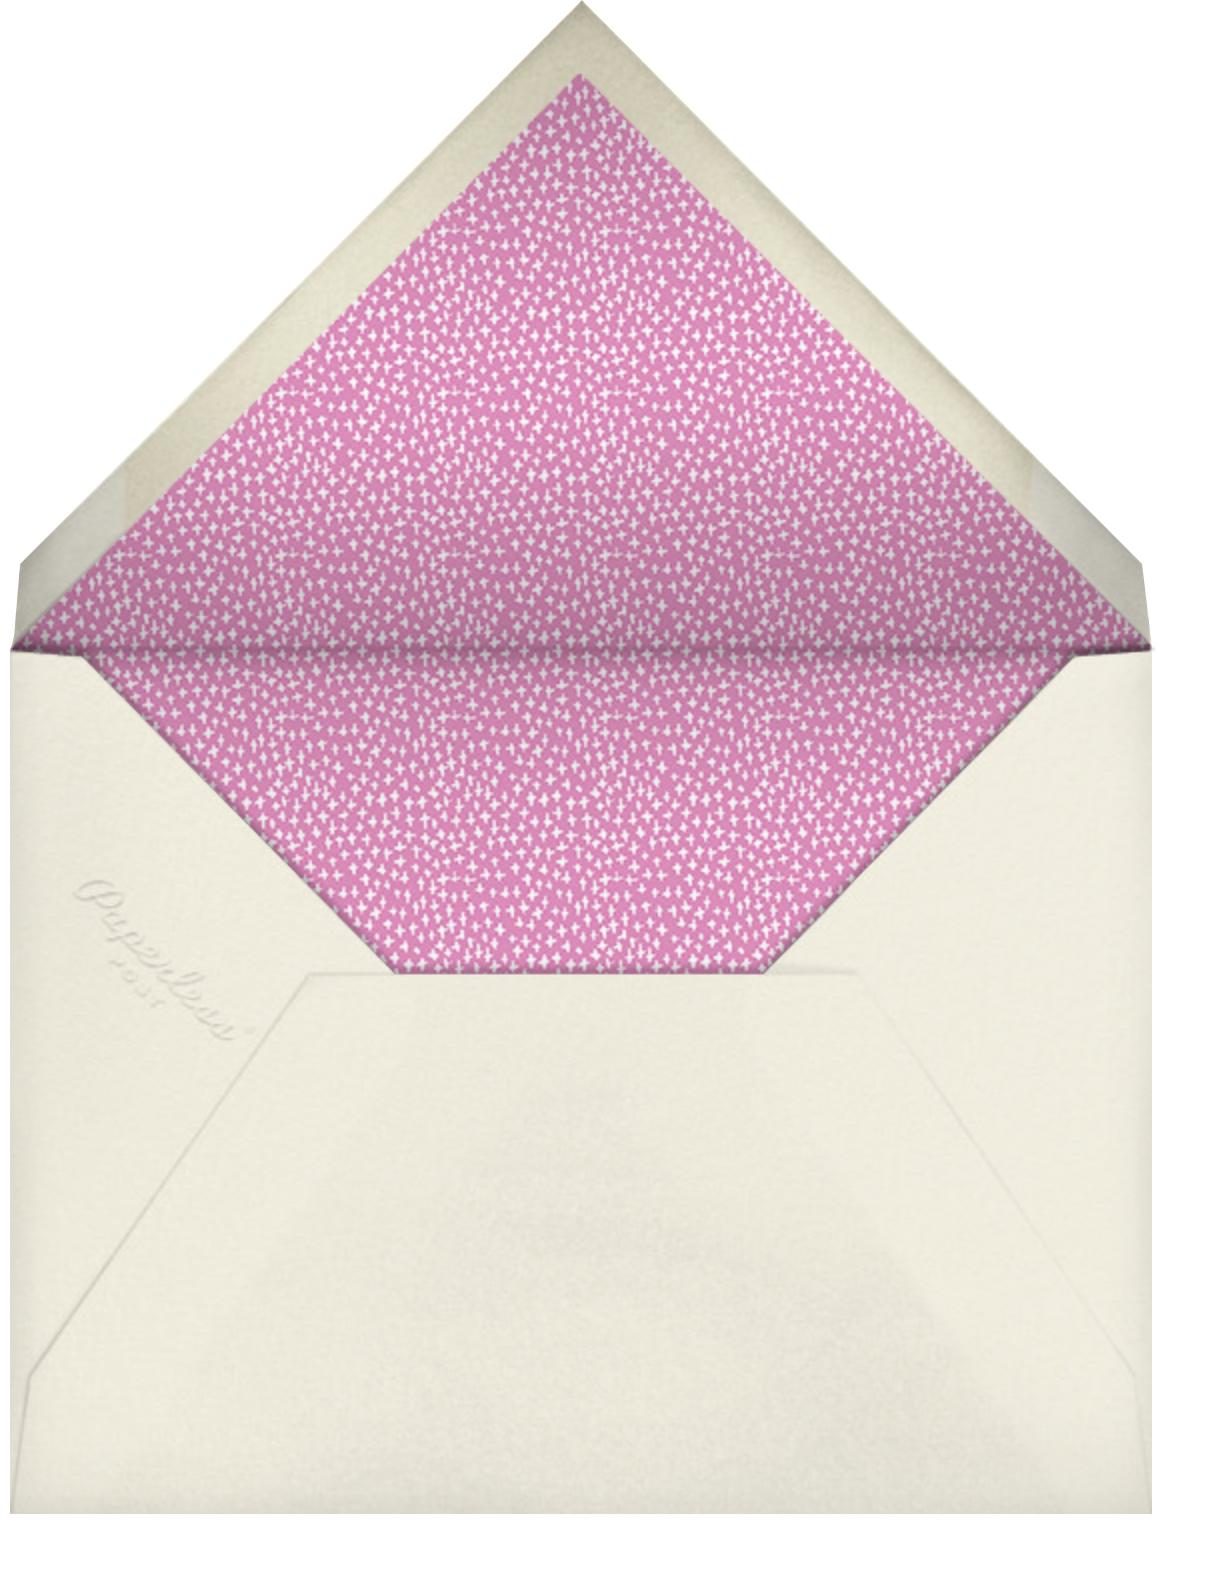 House Slippers - Mr. Boddington's Studio - Holiday party - envelope back